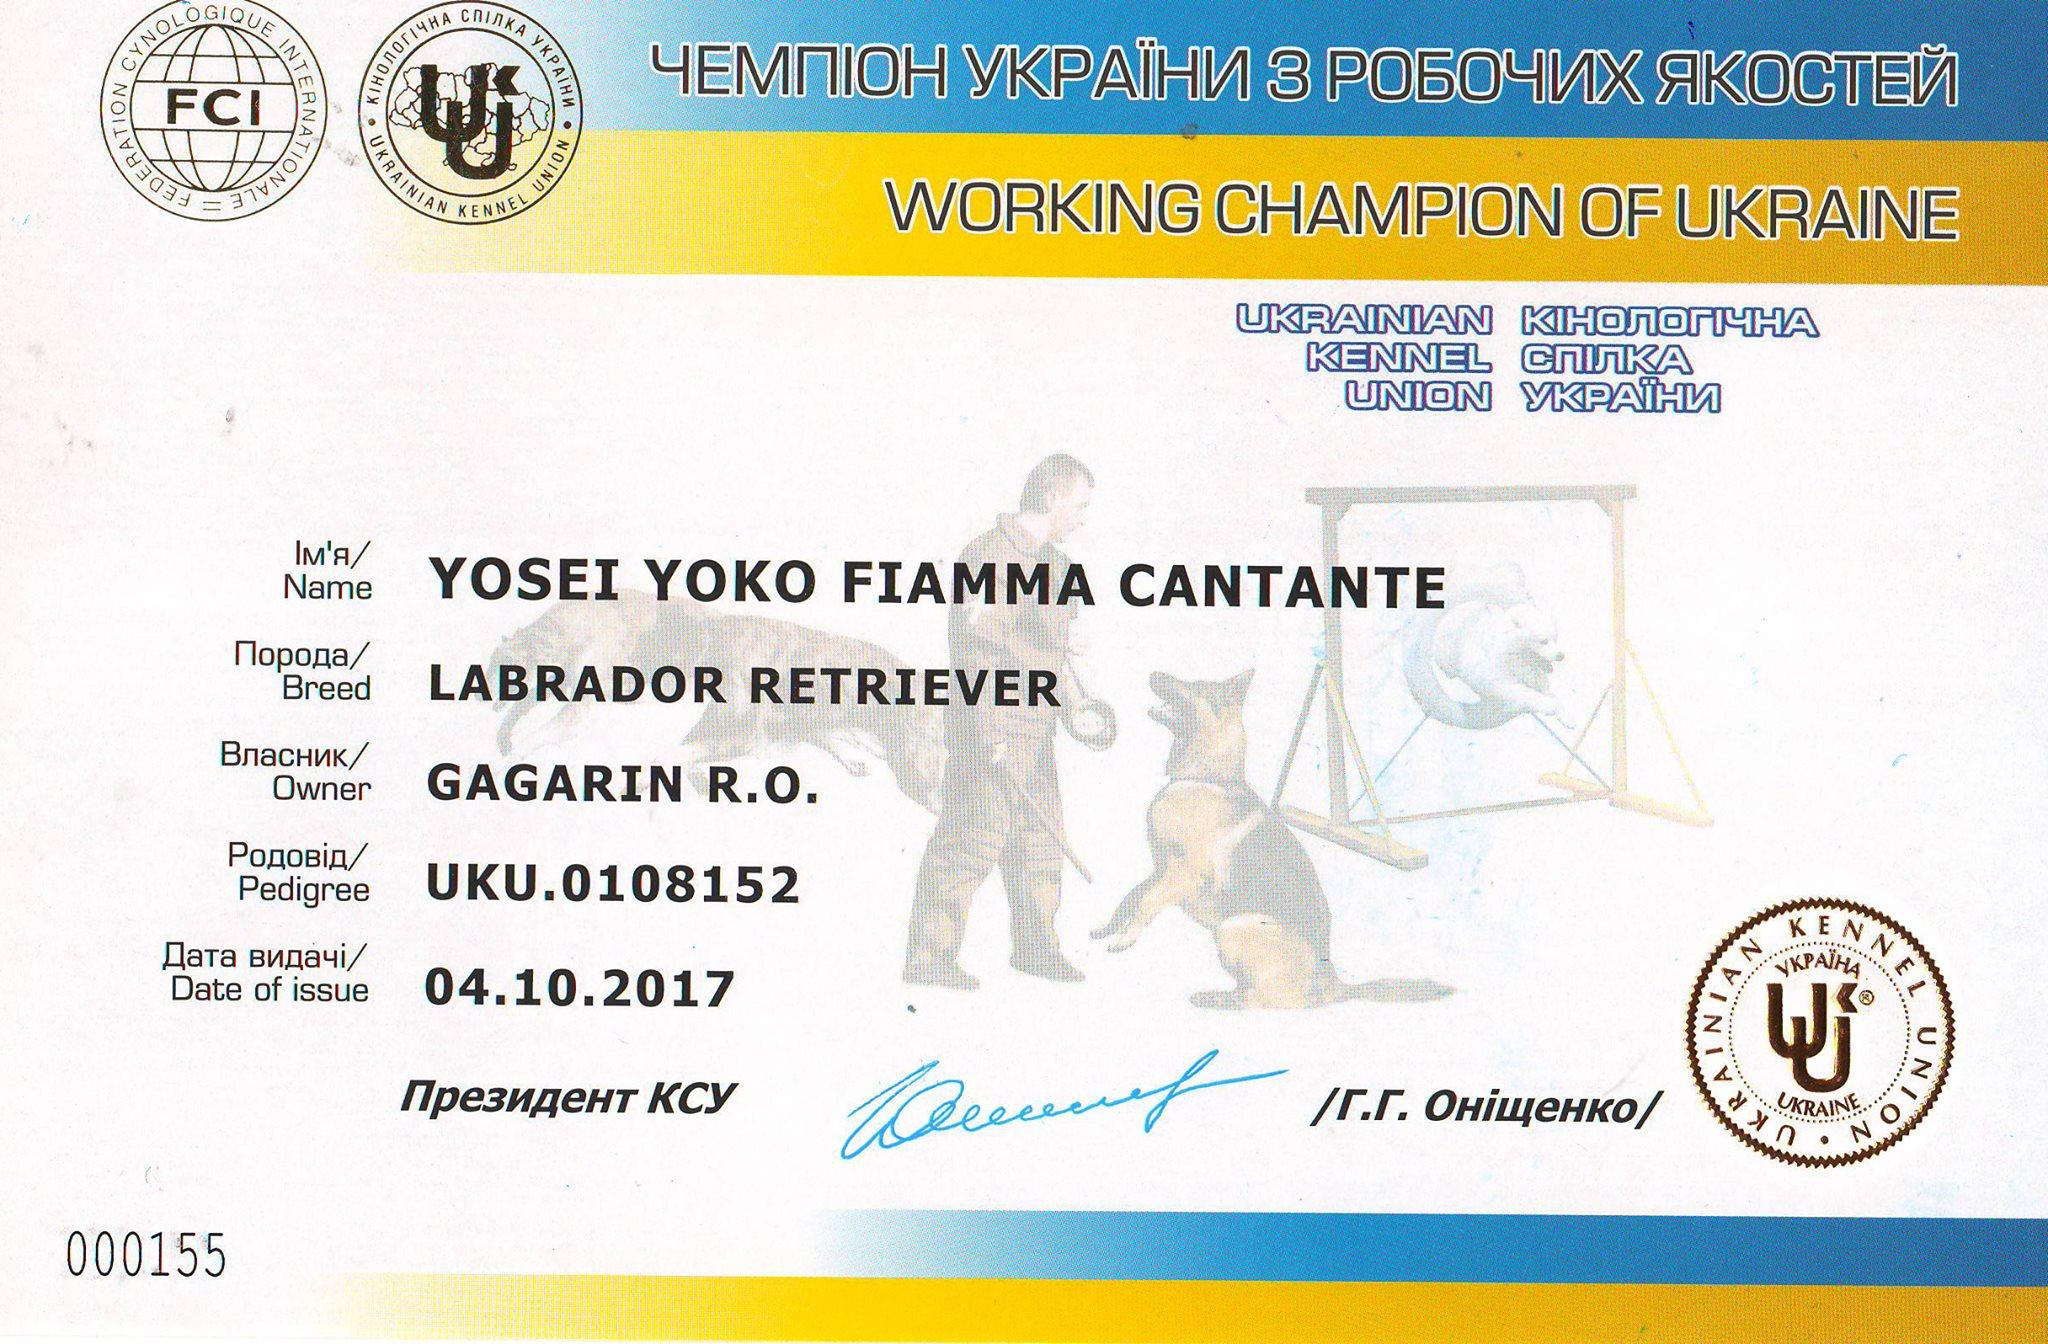 Yosei Yoko Fiamma Cantante_Working Champion